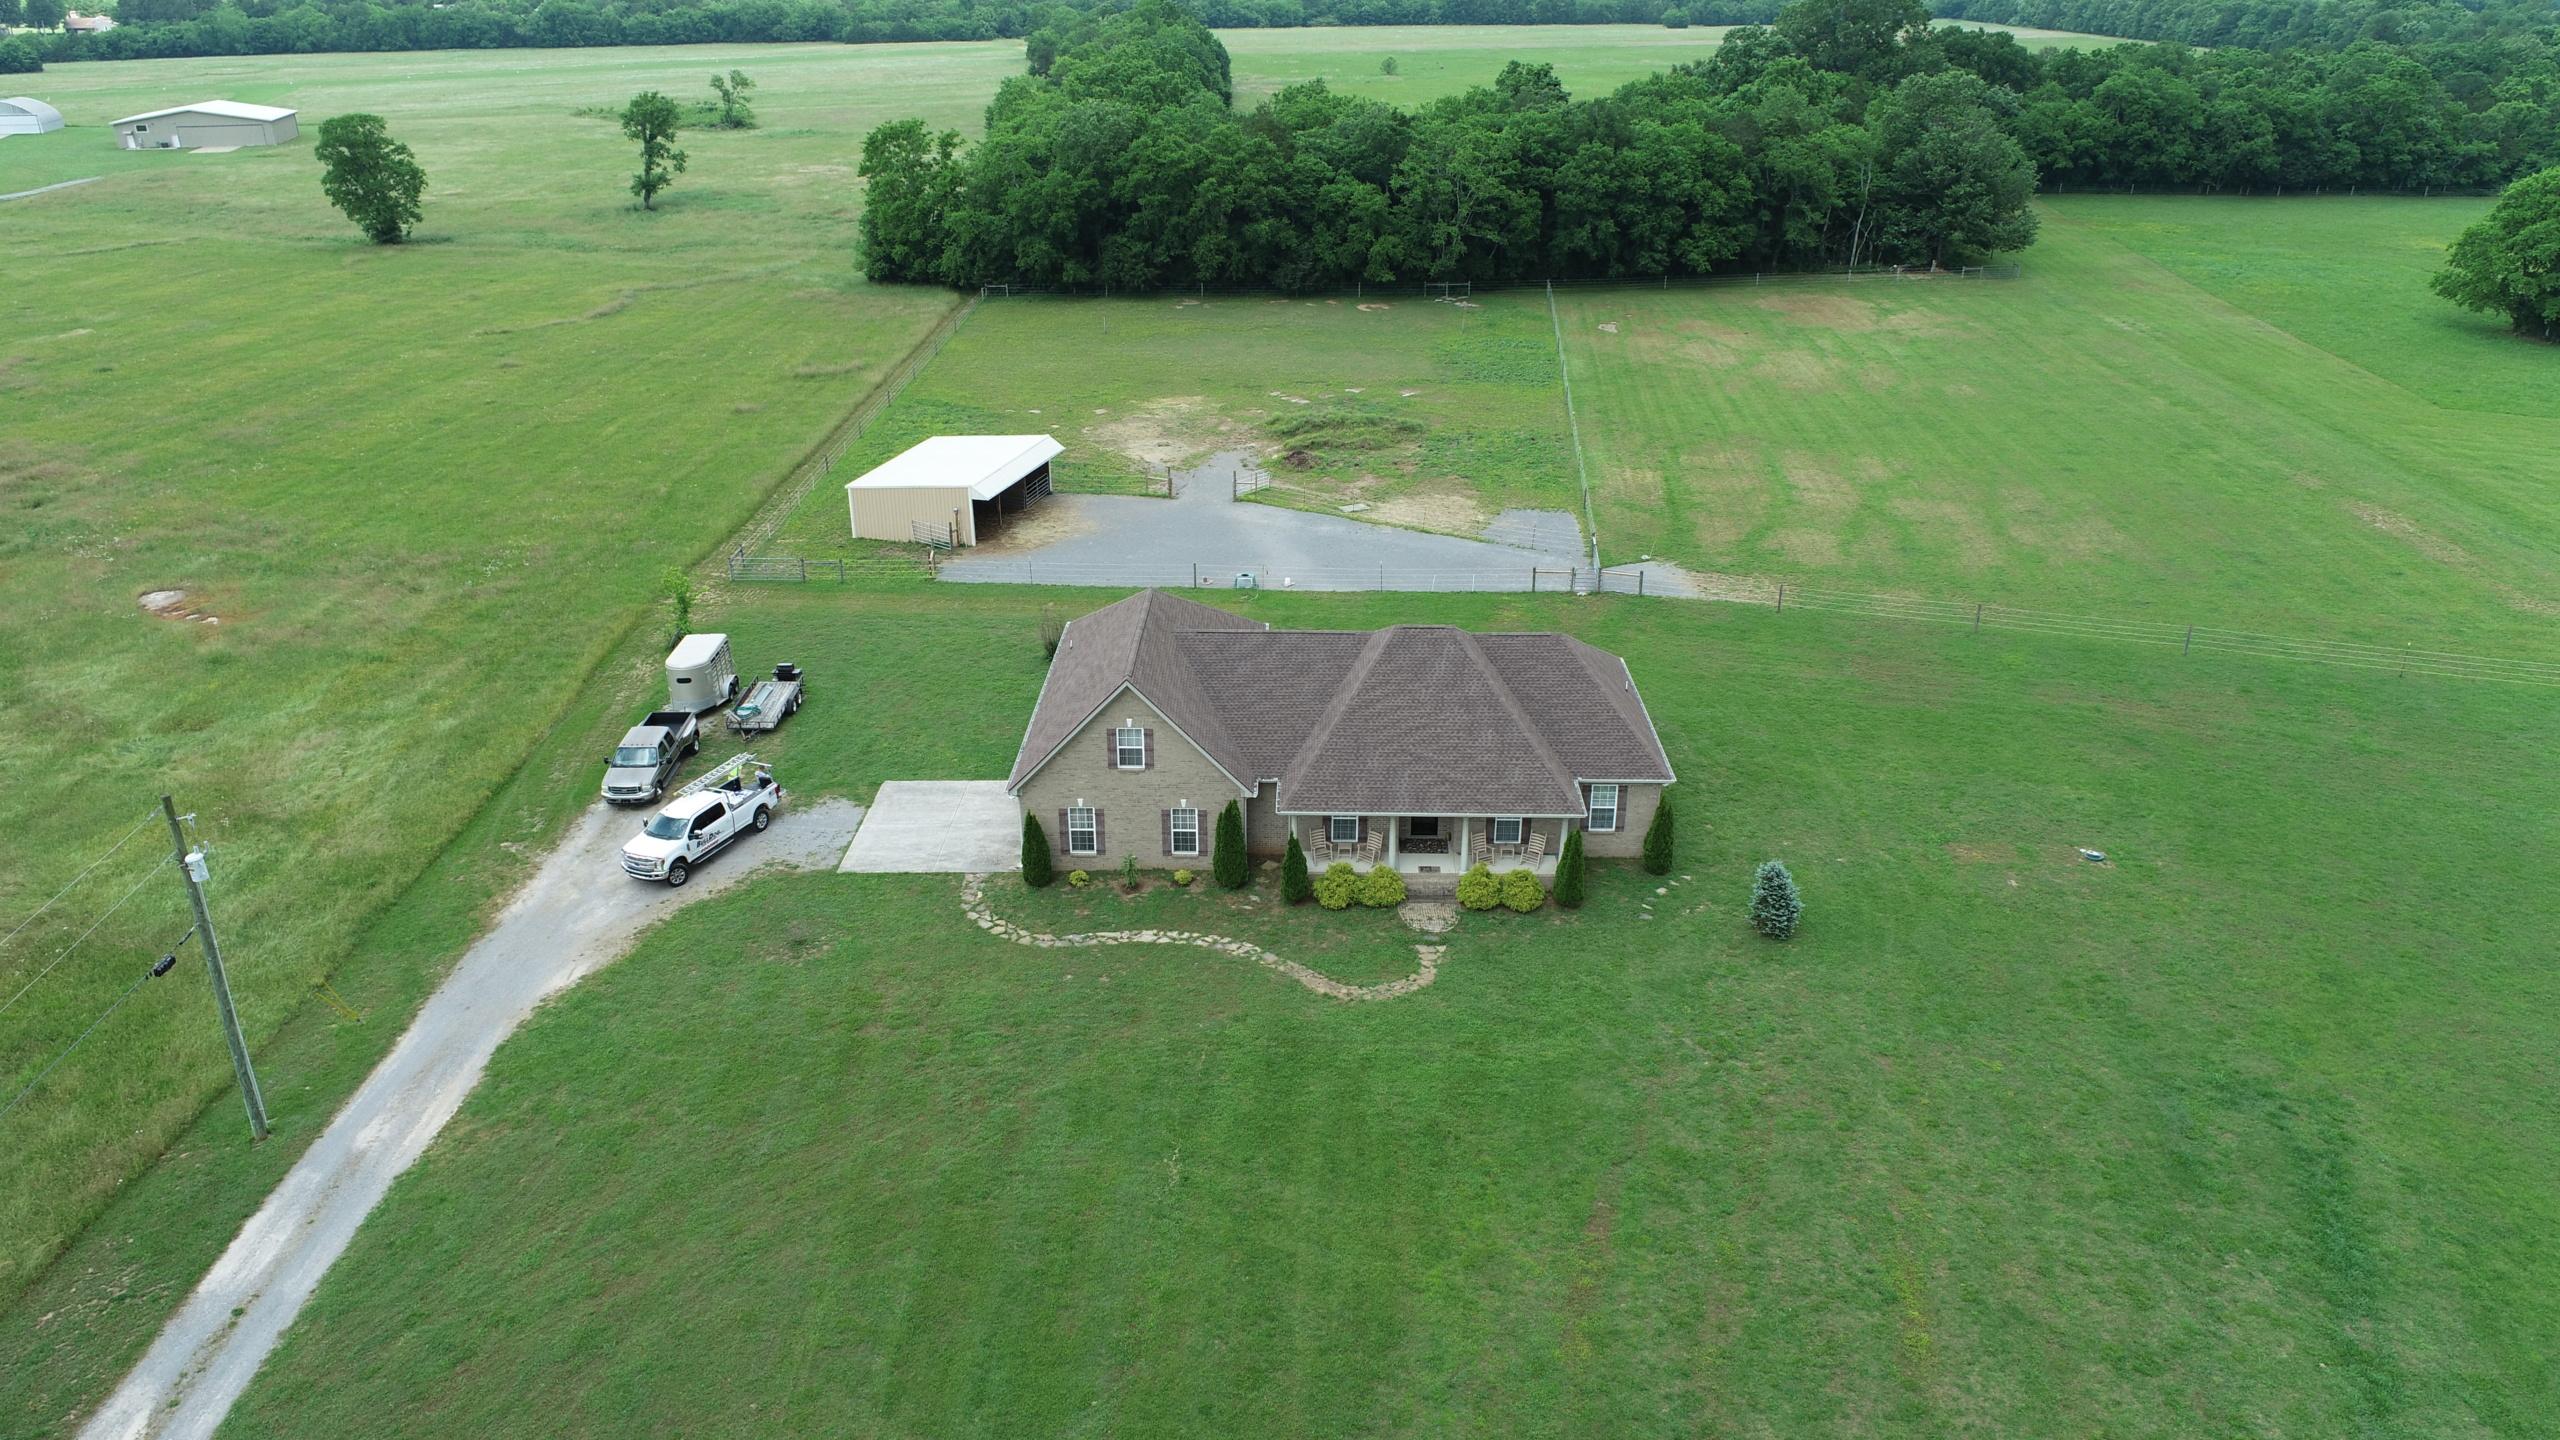 Murfreesboro Roofing Company GAF Barkwood Shingles 1